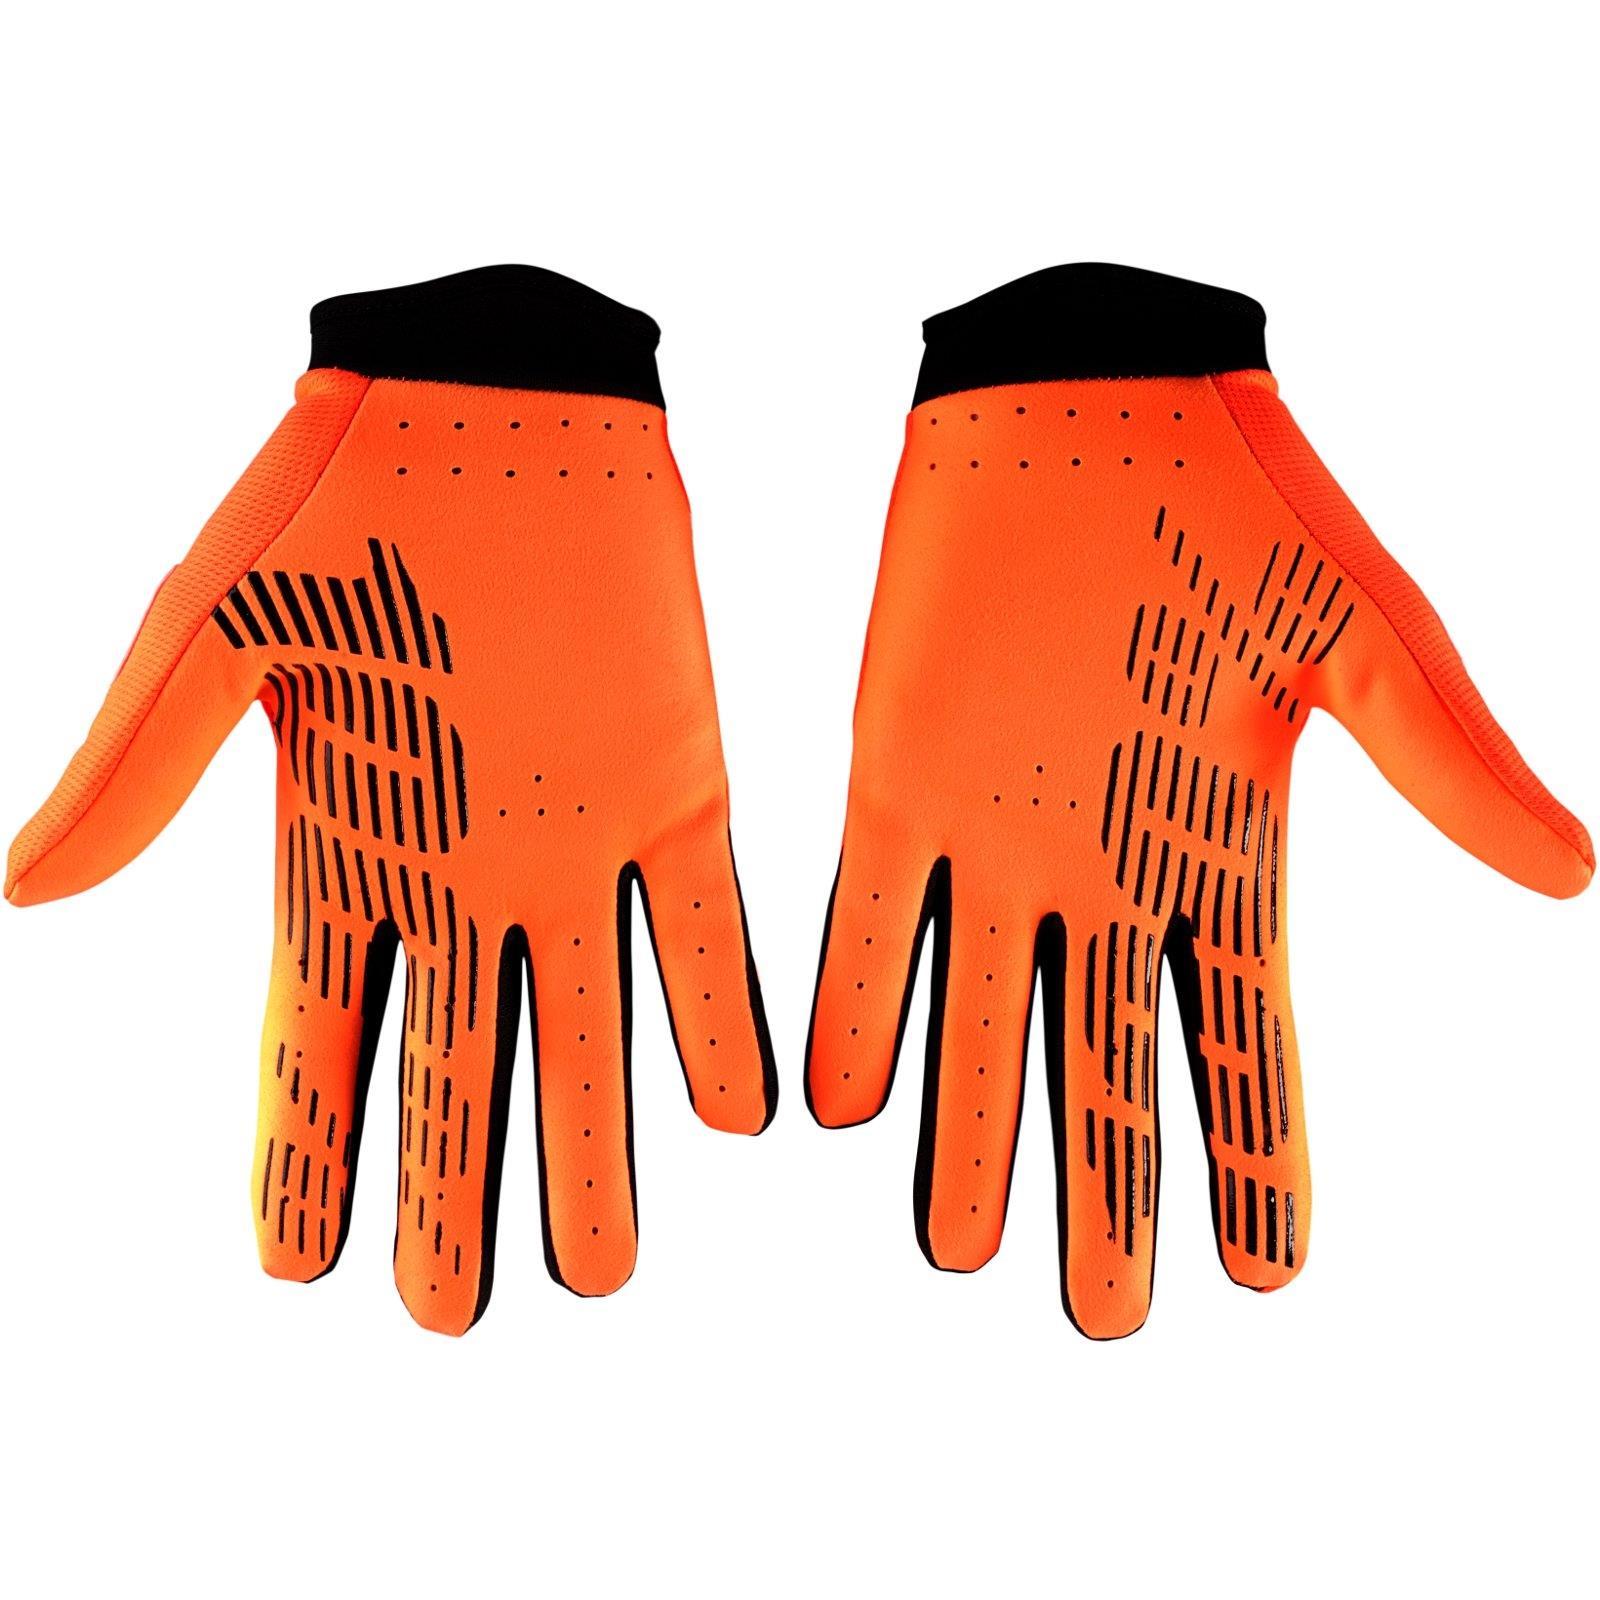 Farbe Caltrans HU-GLO-0003 100/% Prozent iTrack Kinder Handschuhe Clarino MTB DH MX Motocross Enduro Offroad Quad Gr/ö/ße L